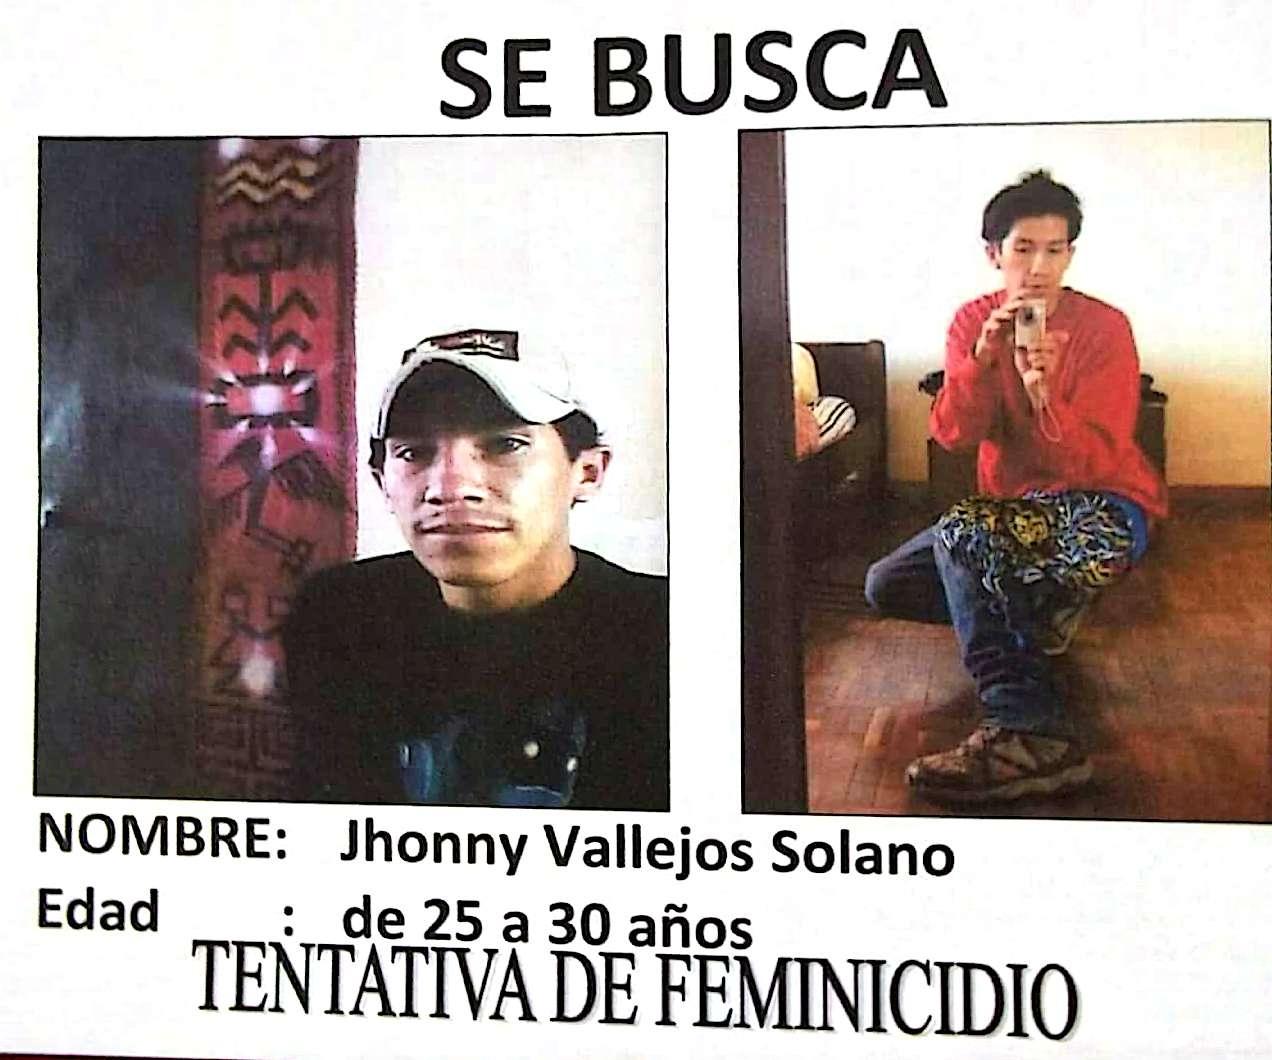 Jhonny Vallejos Solano, feminicida.